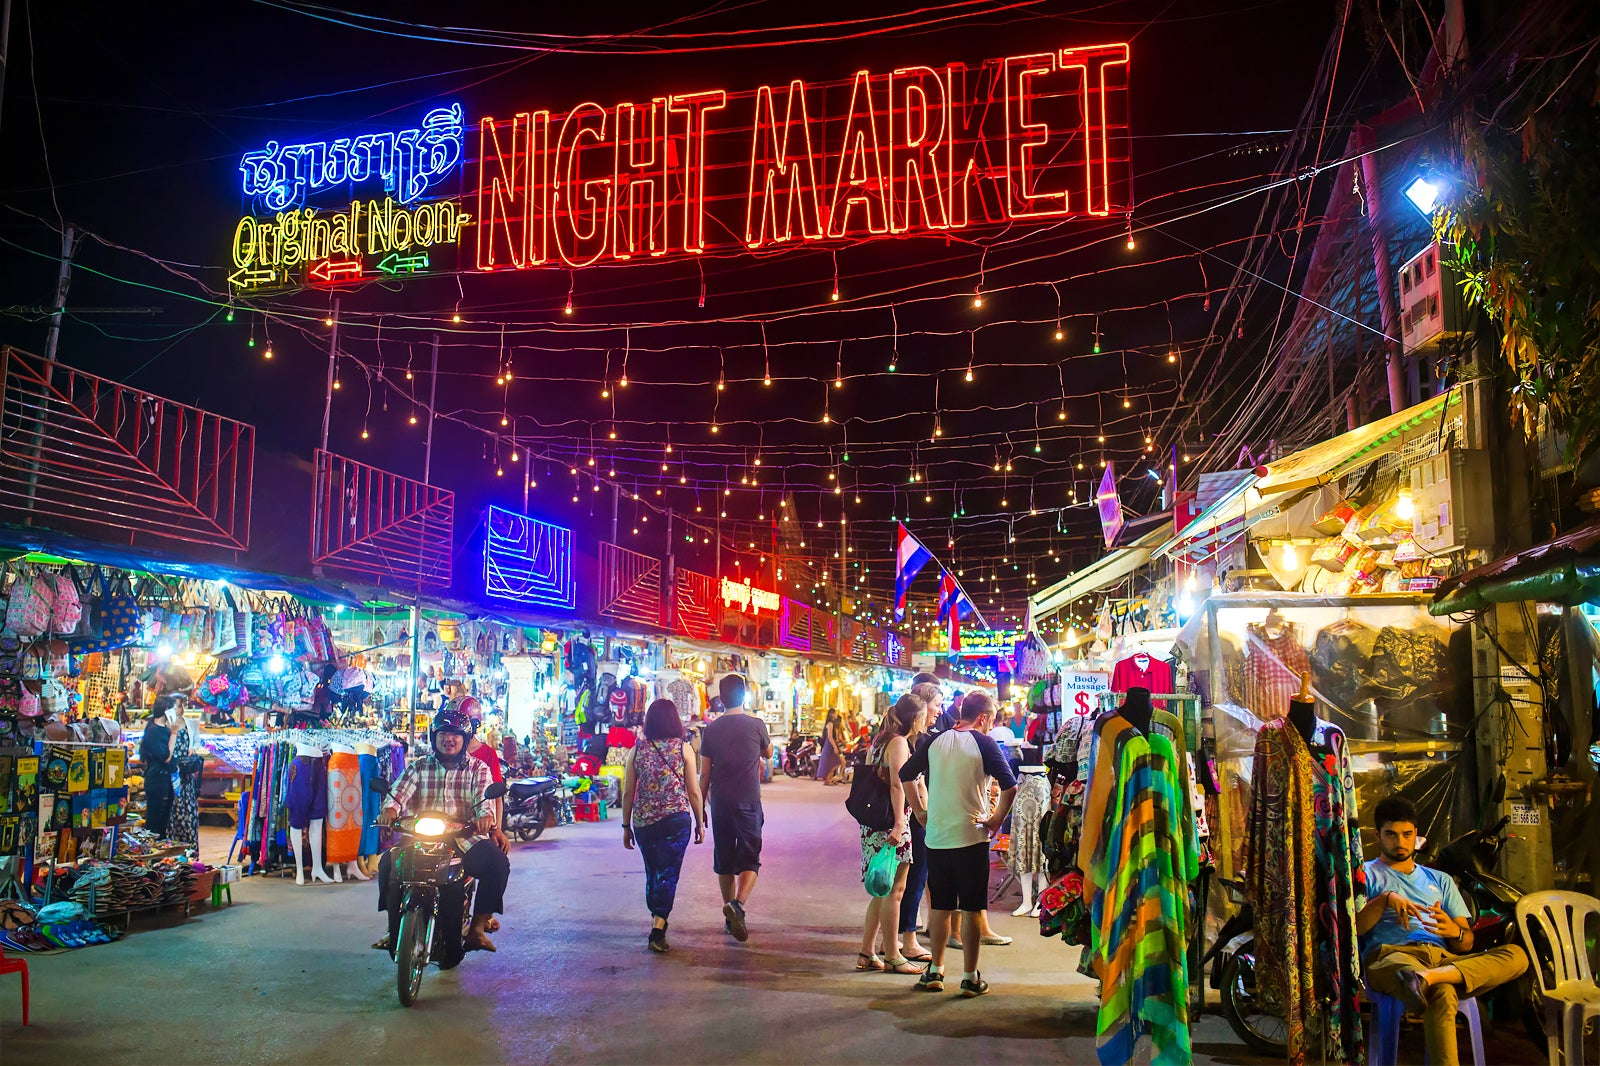 5 Best Night Markets in Siem Reap - Siem Reap's Most Popular Local Markets  - Go Guides